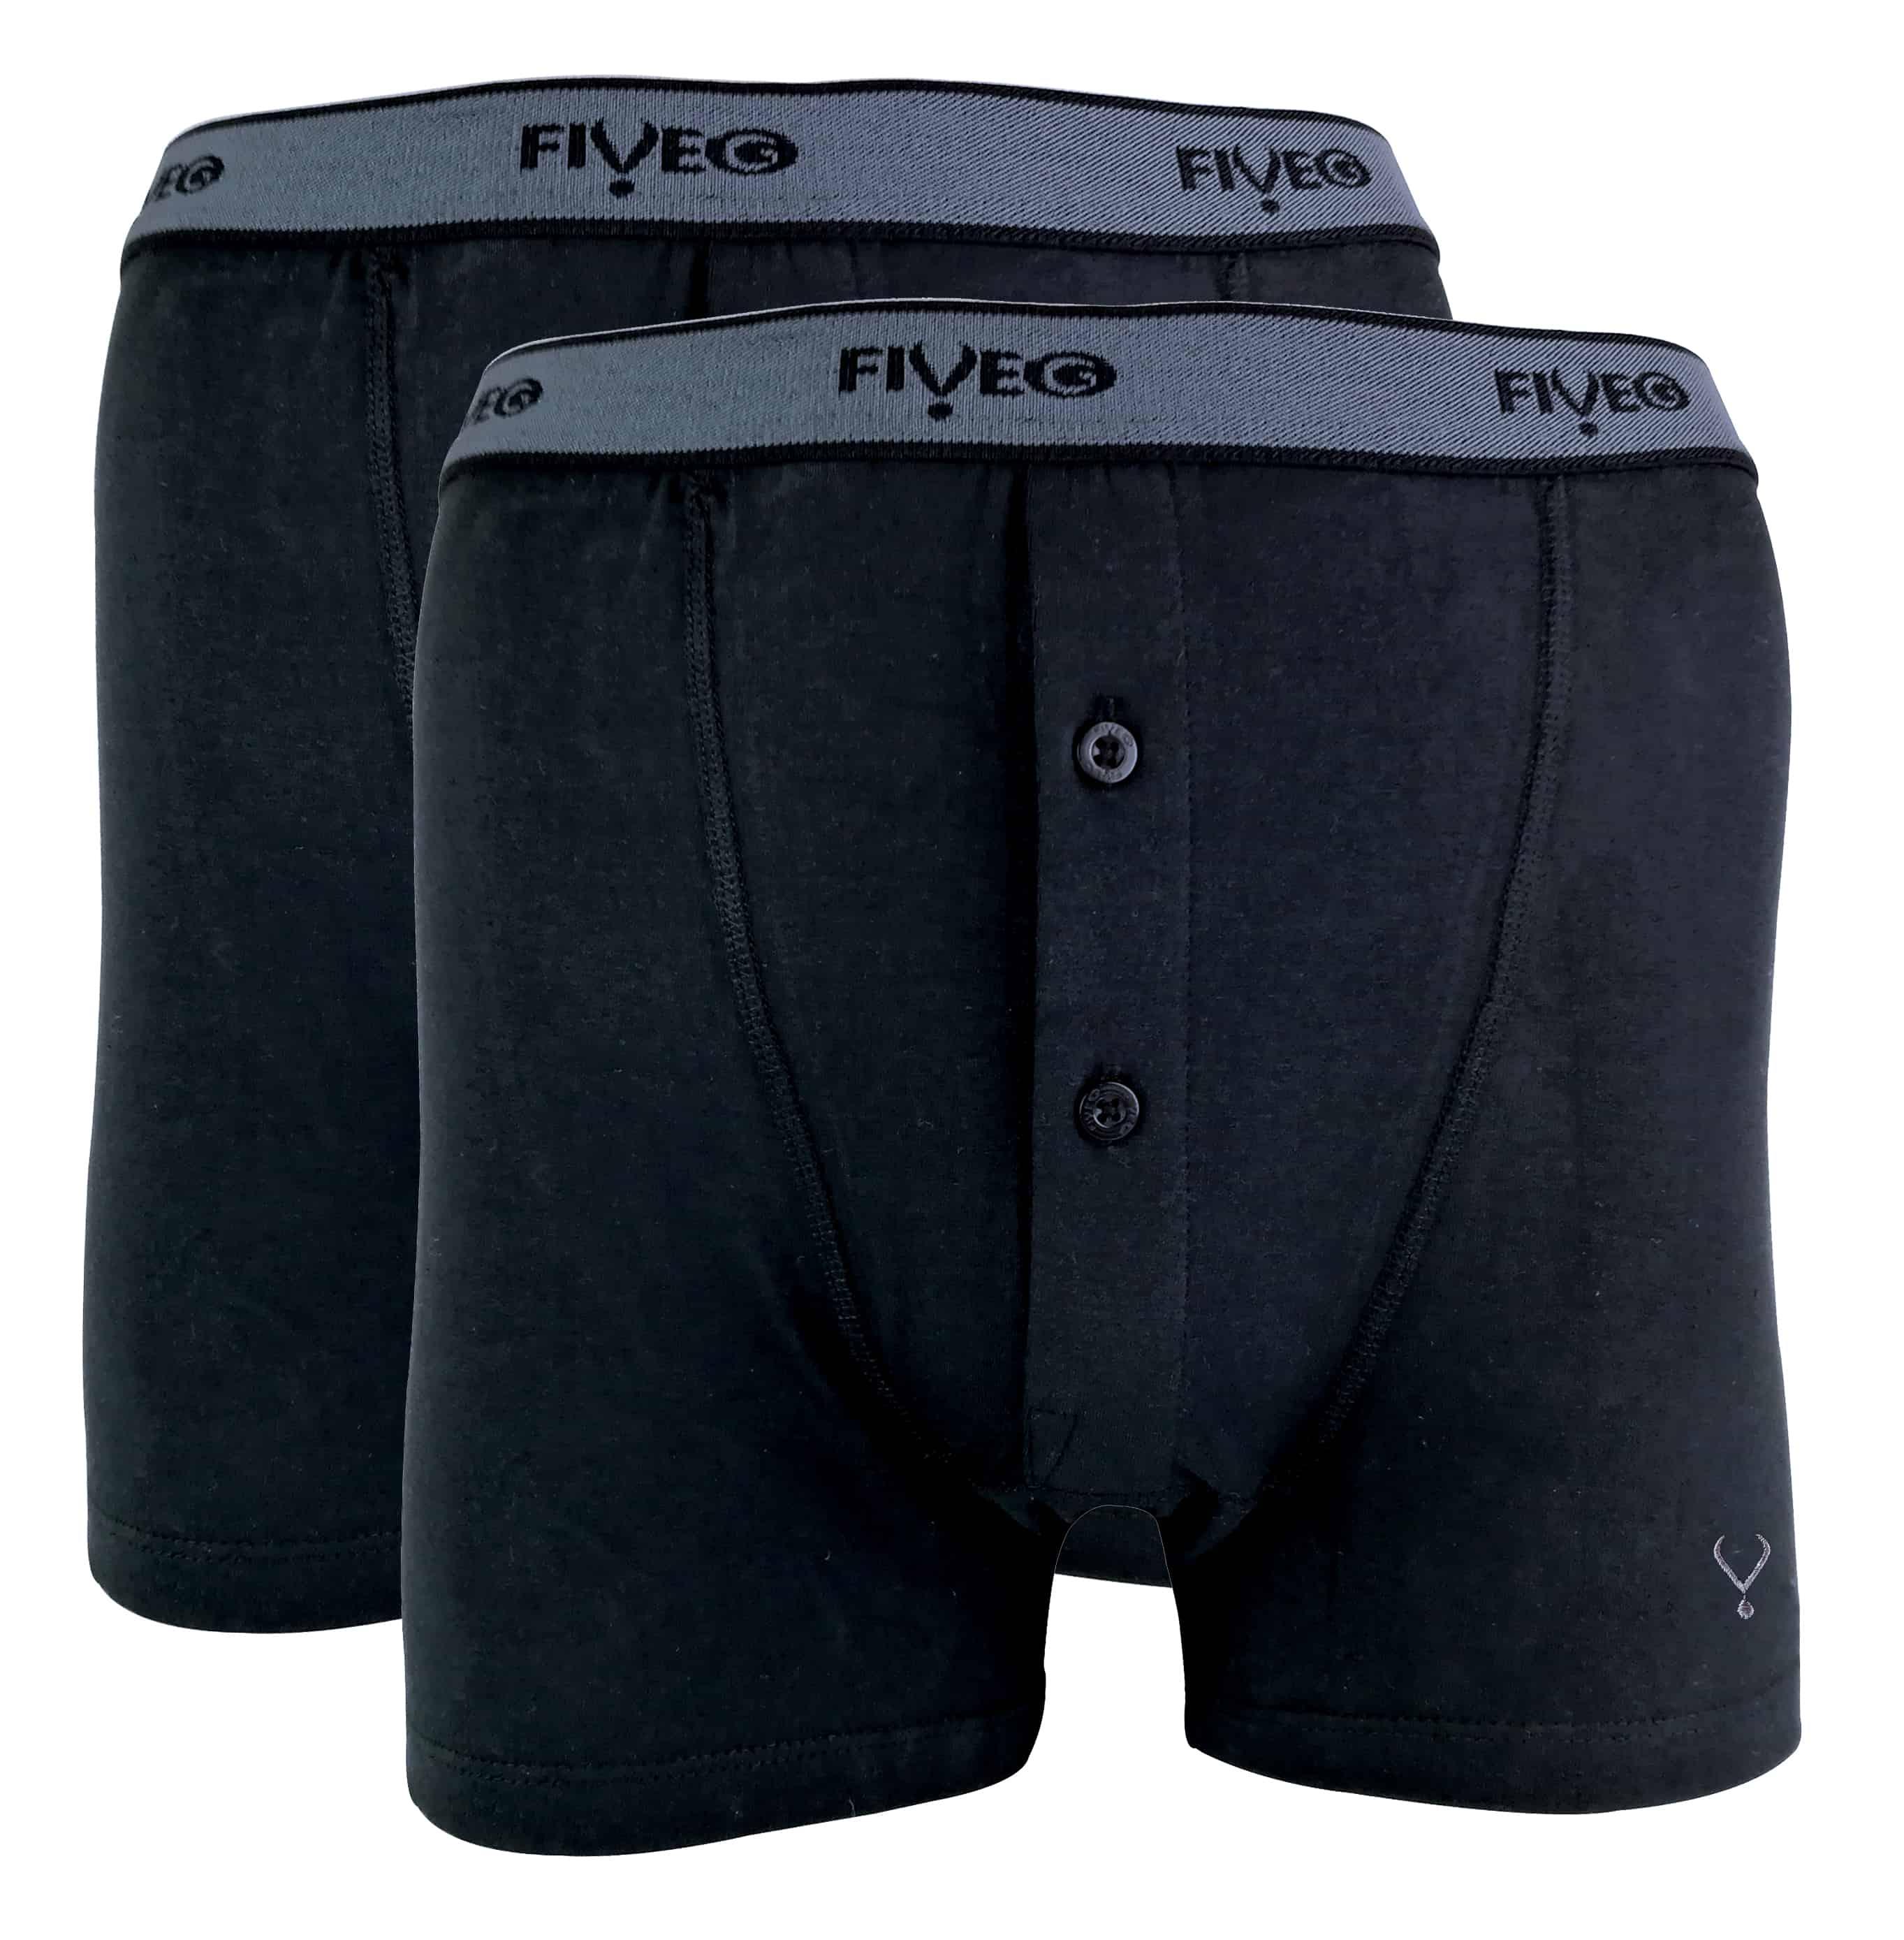 FiveG - 2 Pack Mens Breathable Button Fly Cotton Rich Underwear Boxershorts - Large (36-38